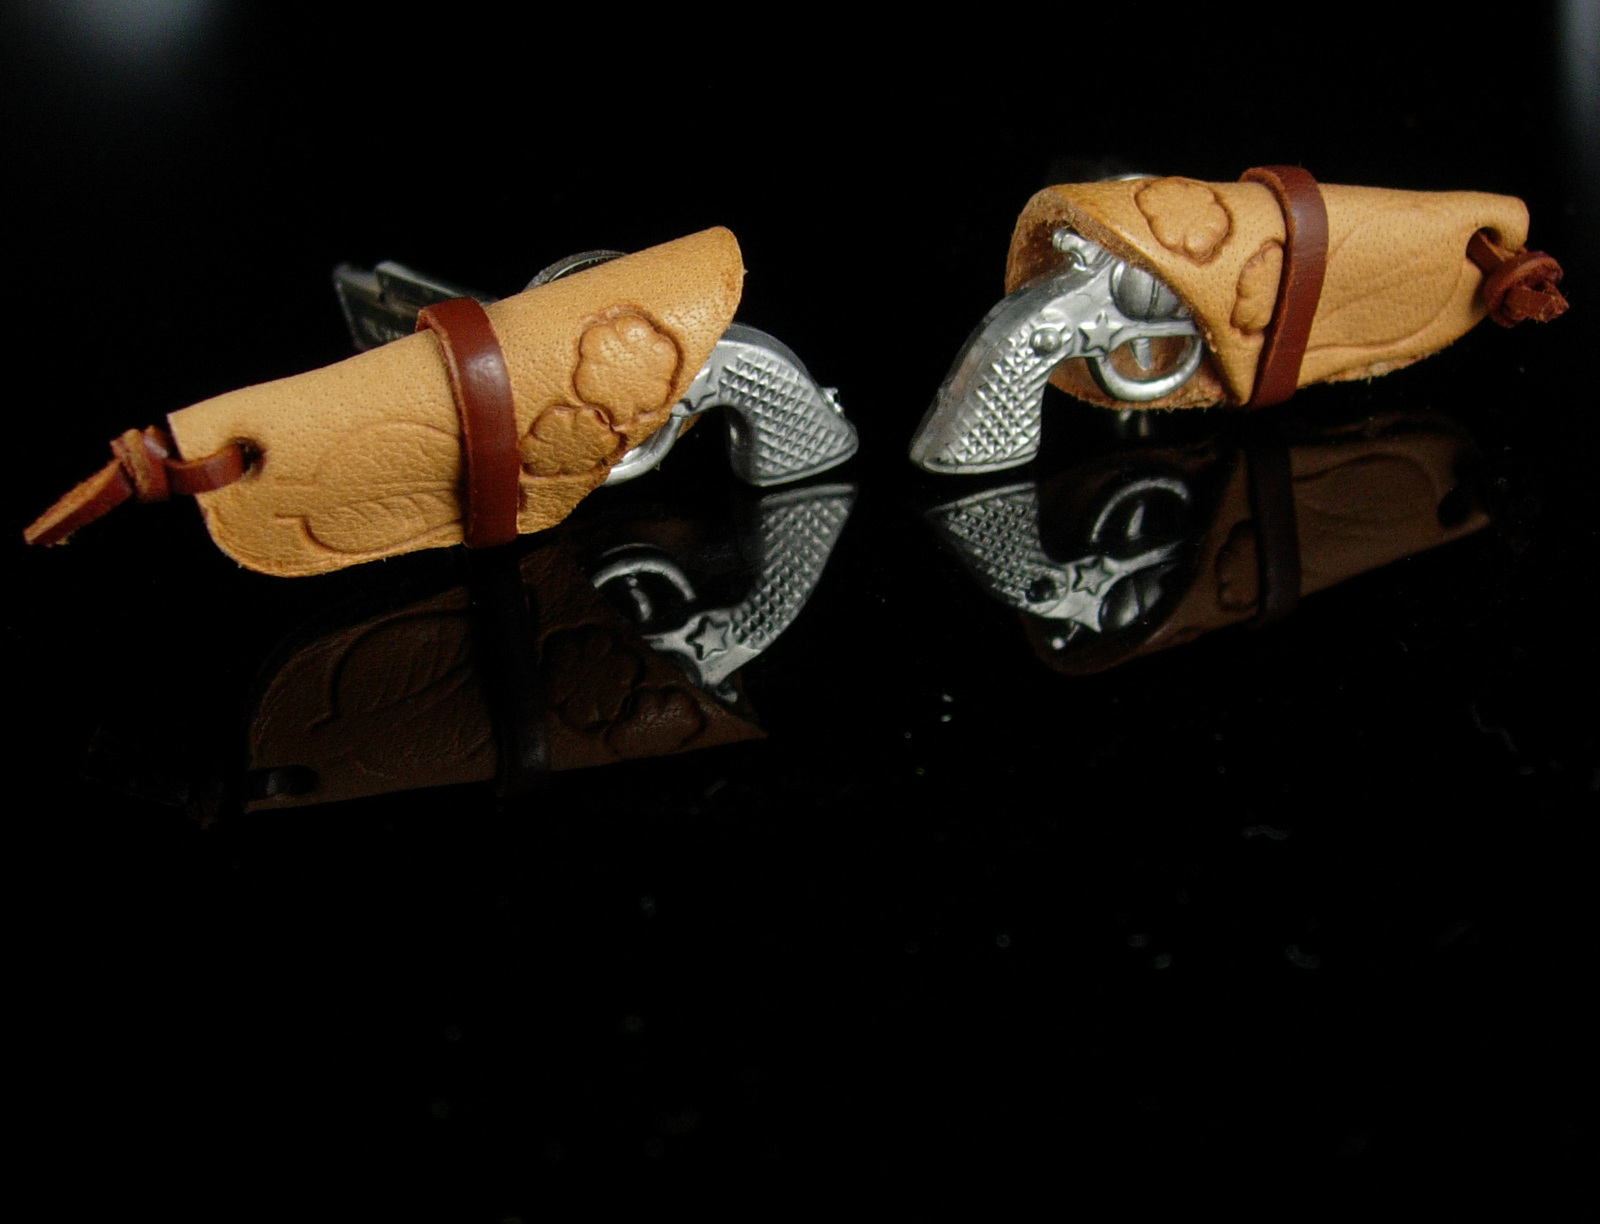 Texas pistol Cufflinks Toy Six Shooter gun Silver Colt Novelty hand tooled leath